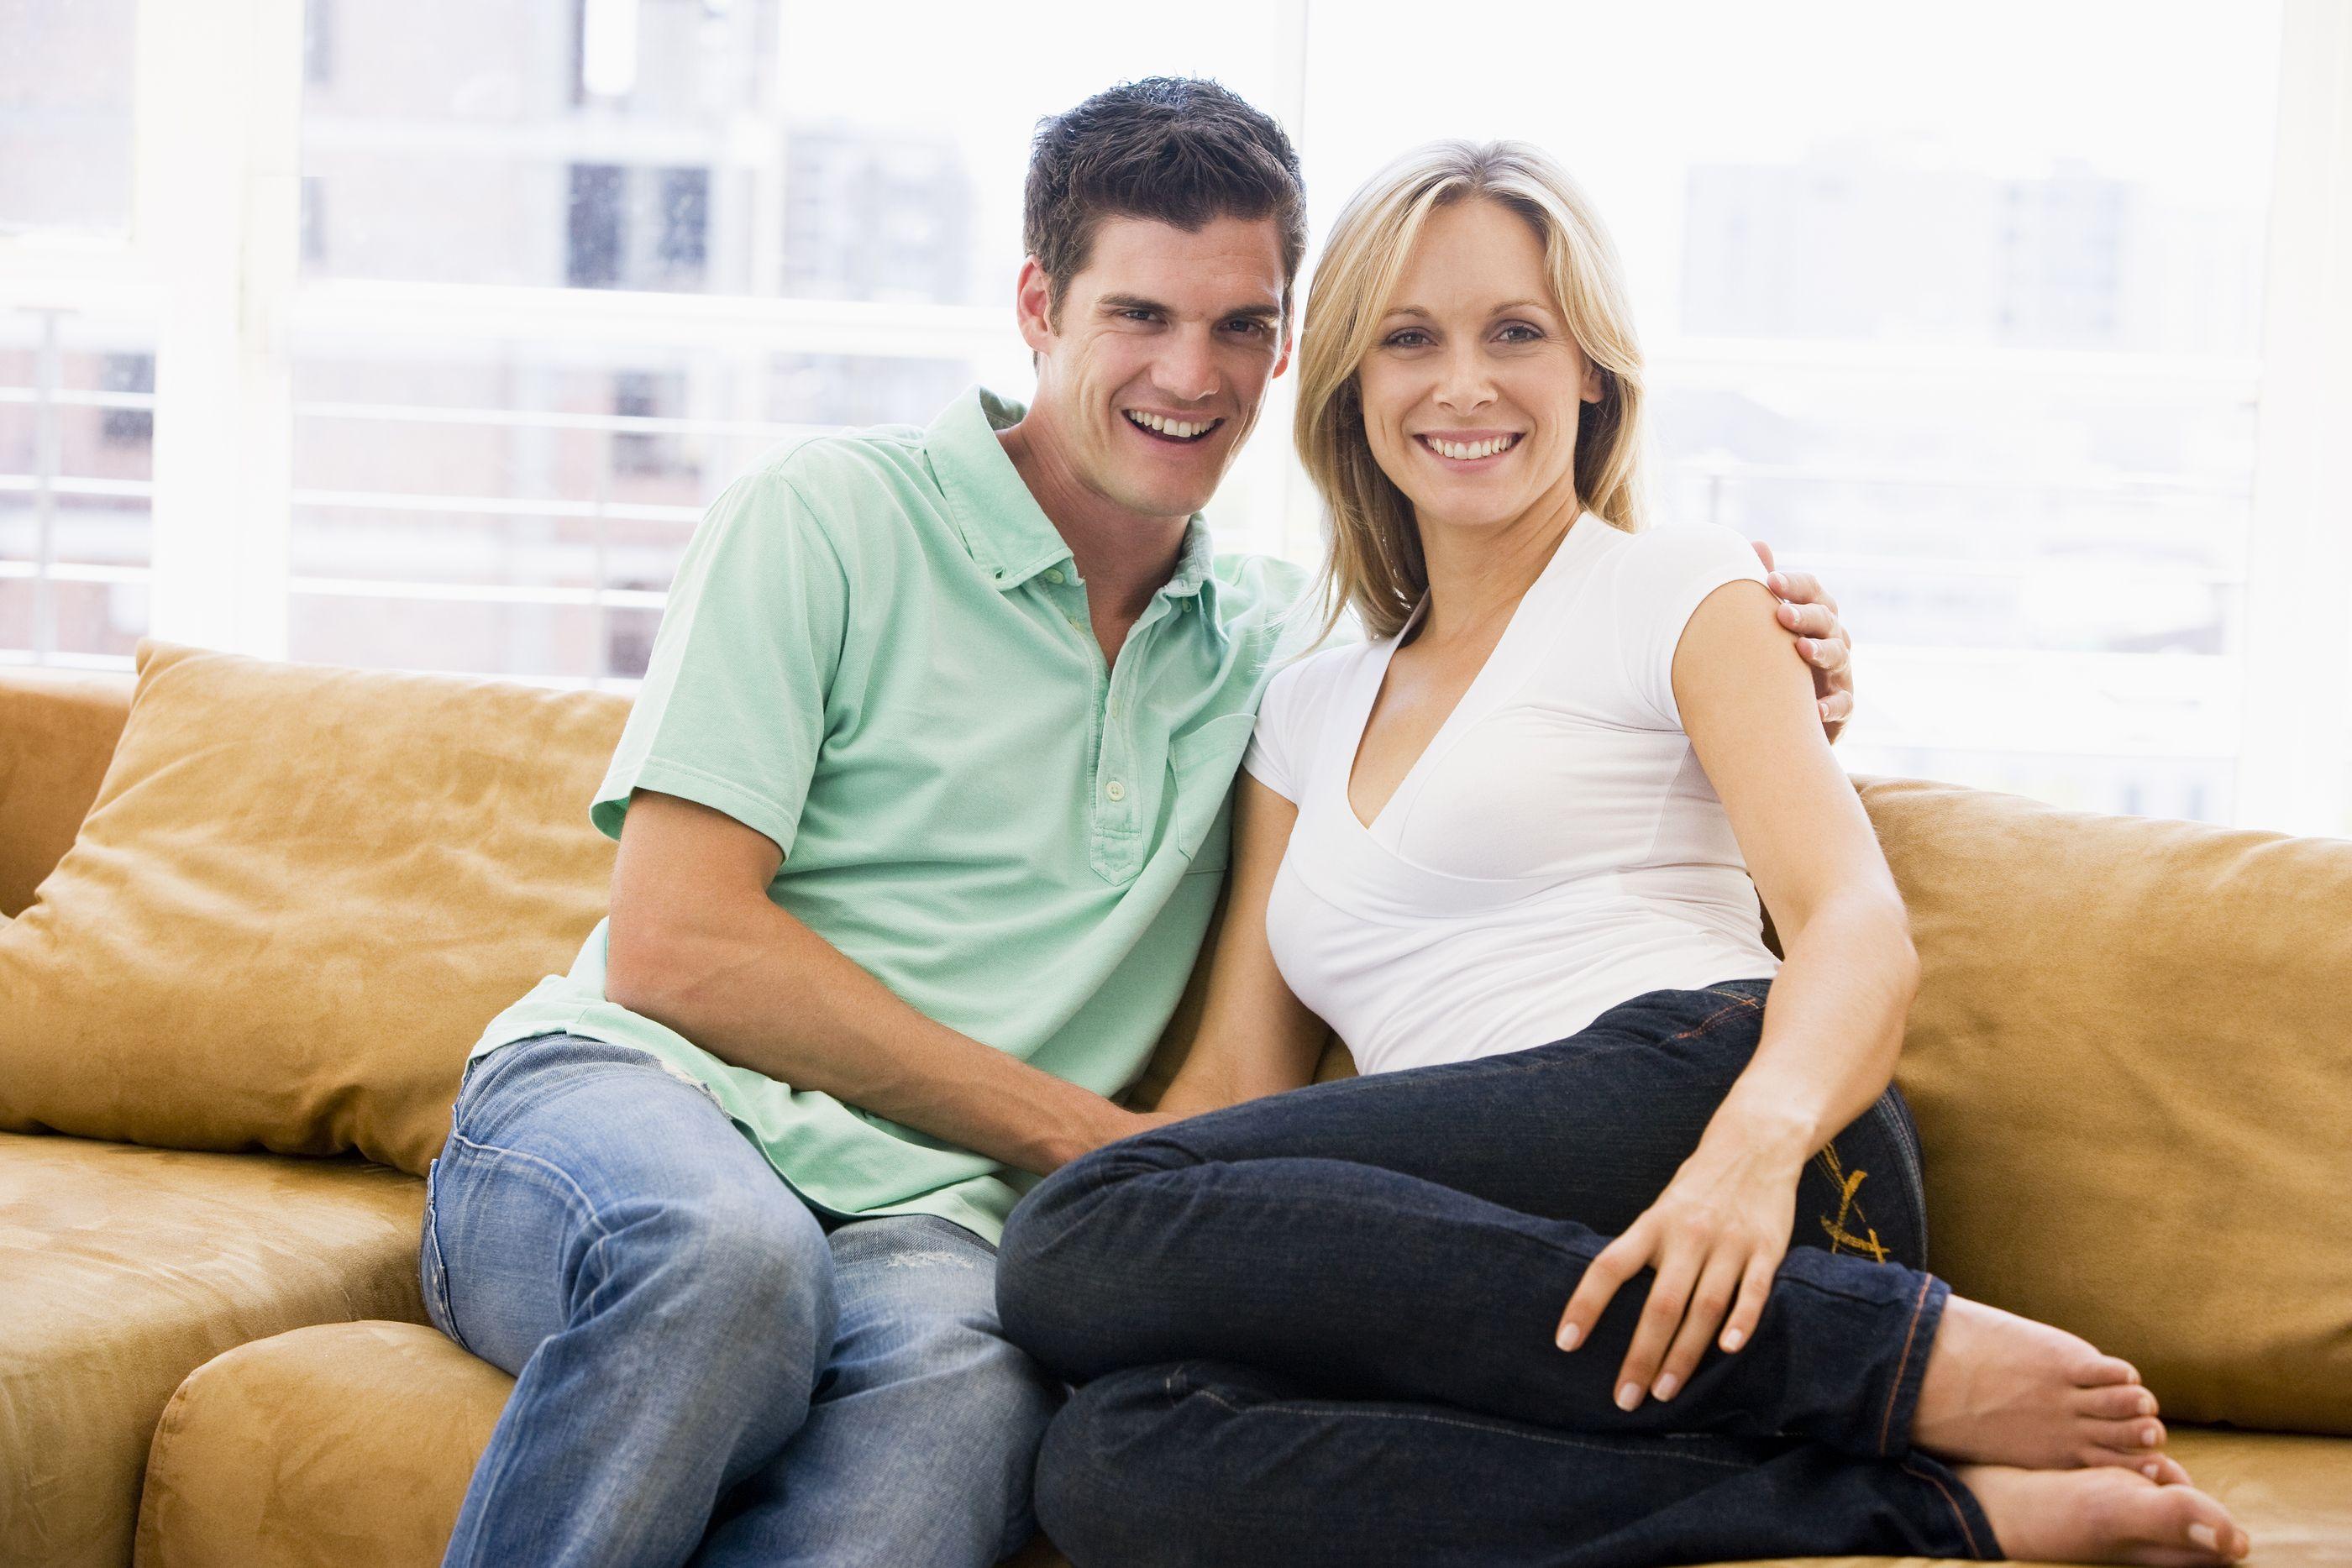 Pin on Older Women Younger Men Dating